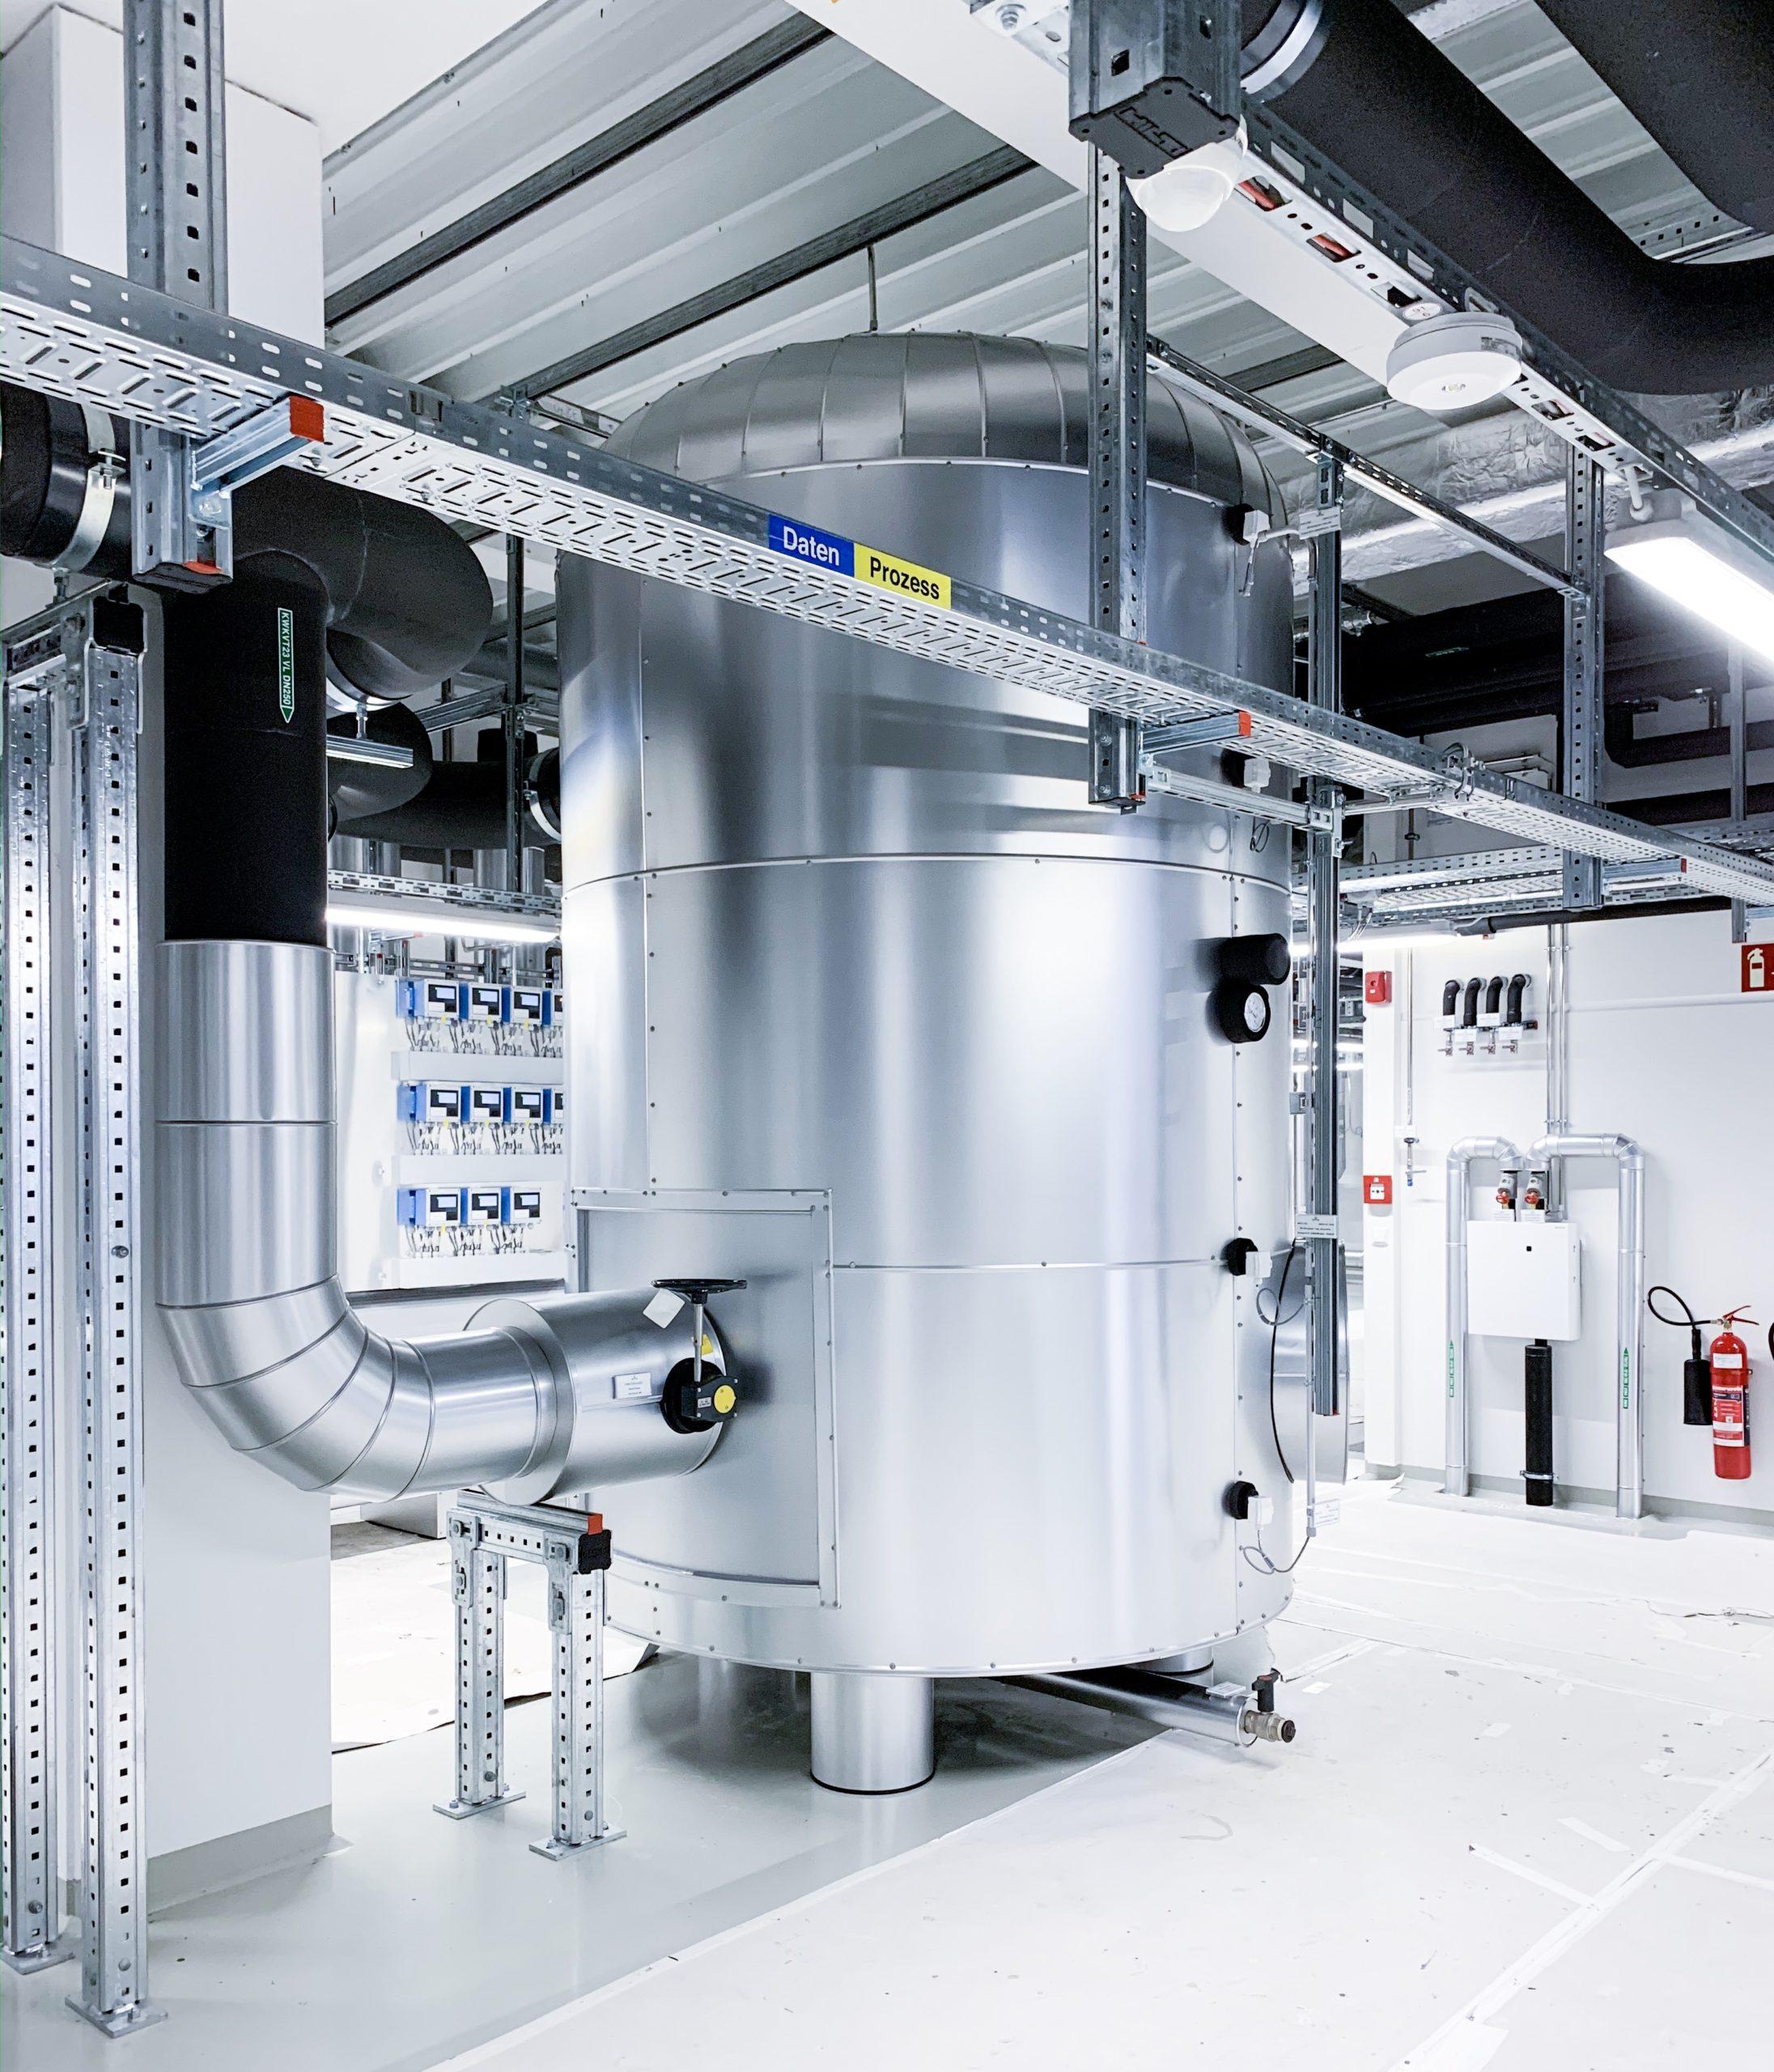 Pufferspeicher Kältezentrale Vetter Pharma GmbH | Standort Mariatal